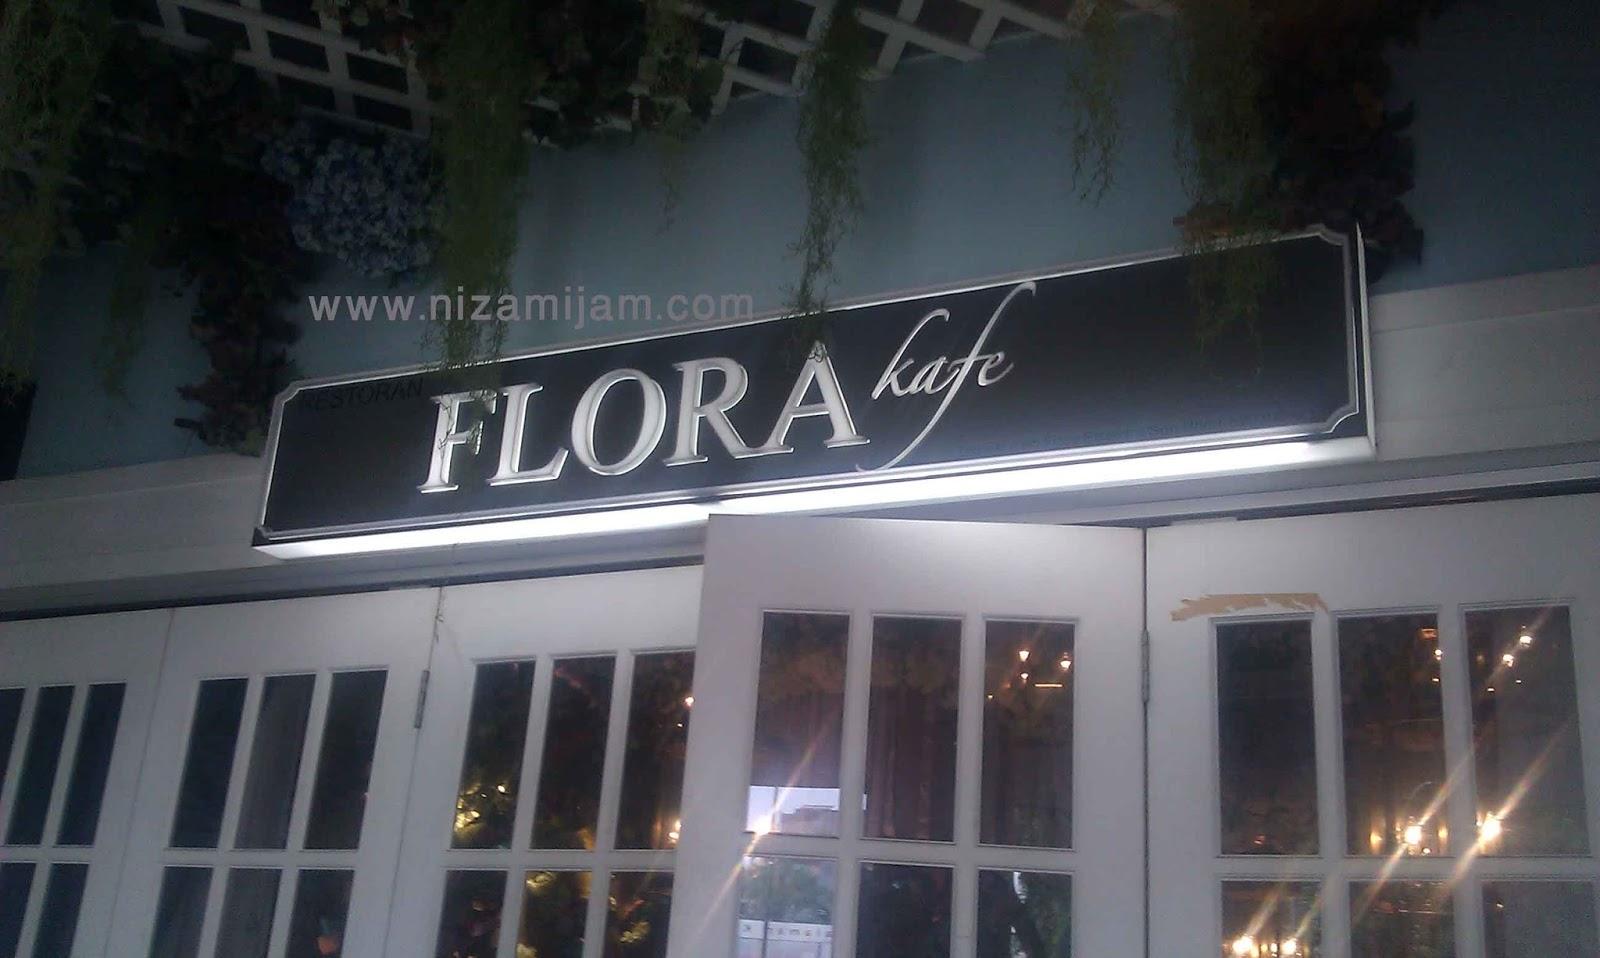 flora kafe, ampwalk, jalan ampang, kuala lumpur, lunch, tempat makan, vintage